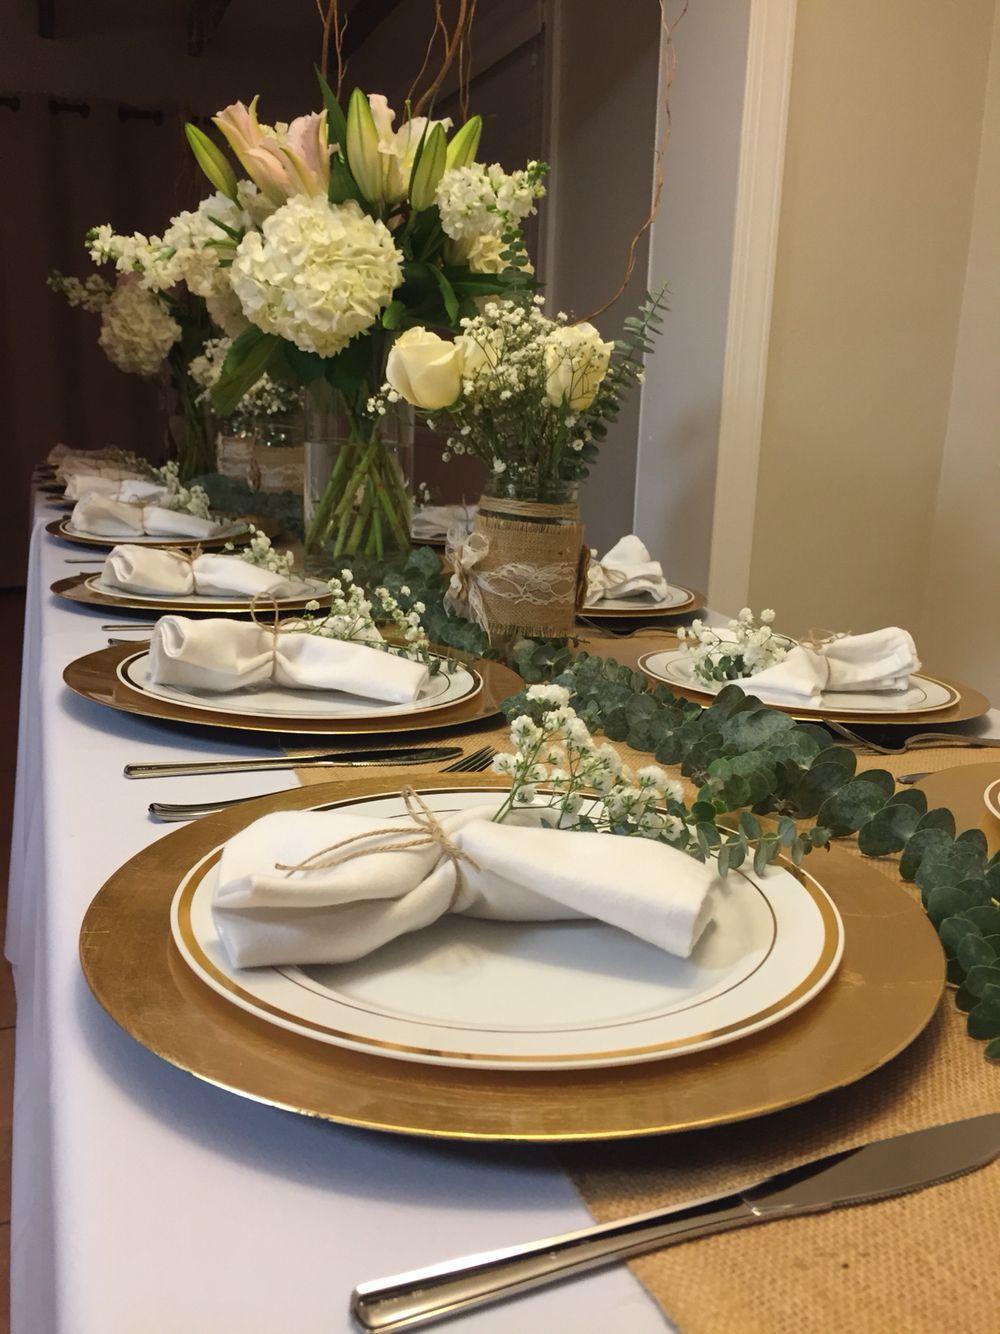 Rustic Table Setting #RusticTableSetting #BurlapandLace #HydrangeasLiliesandRoses #Eucalyptus #BabyBreath #WillowTips